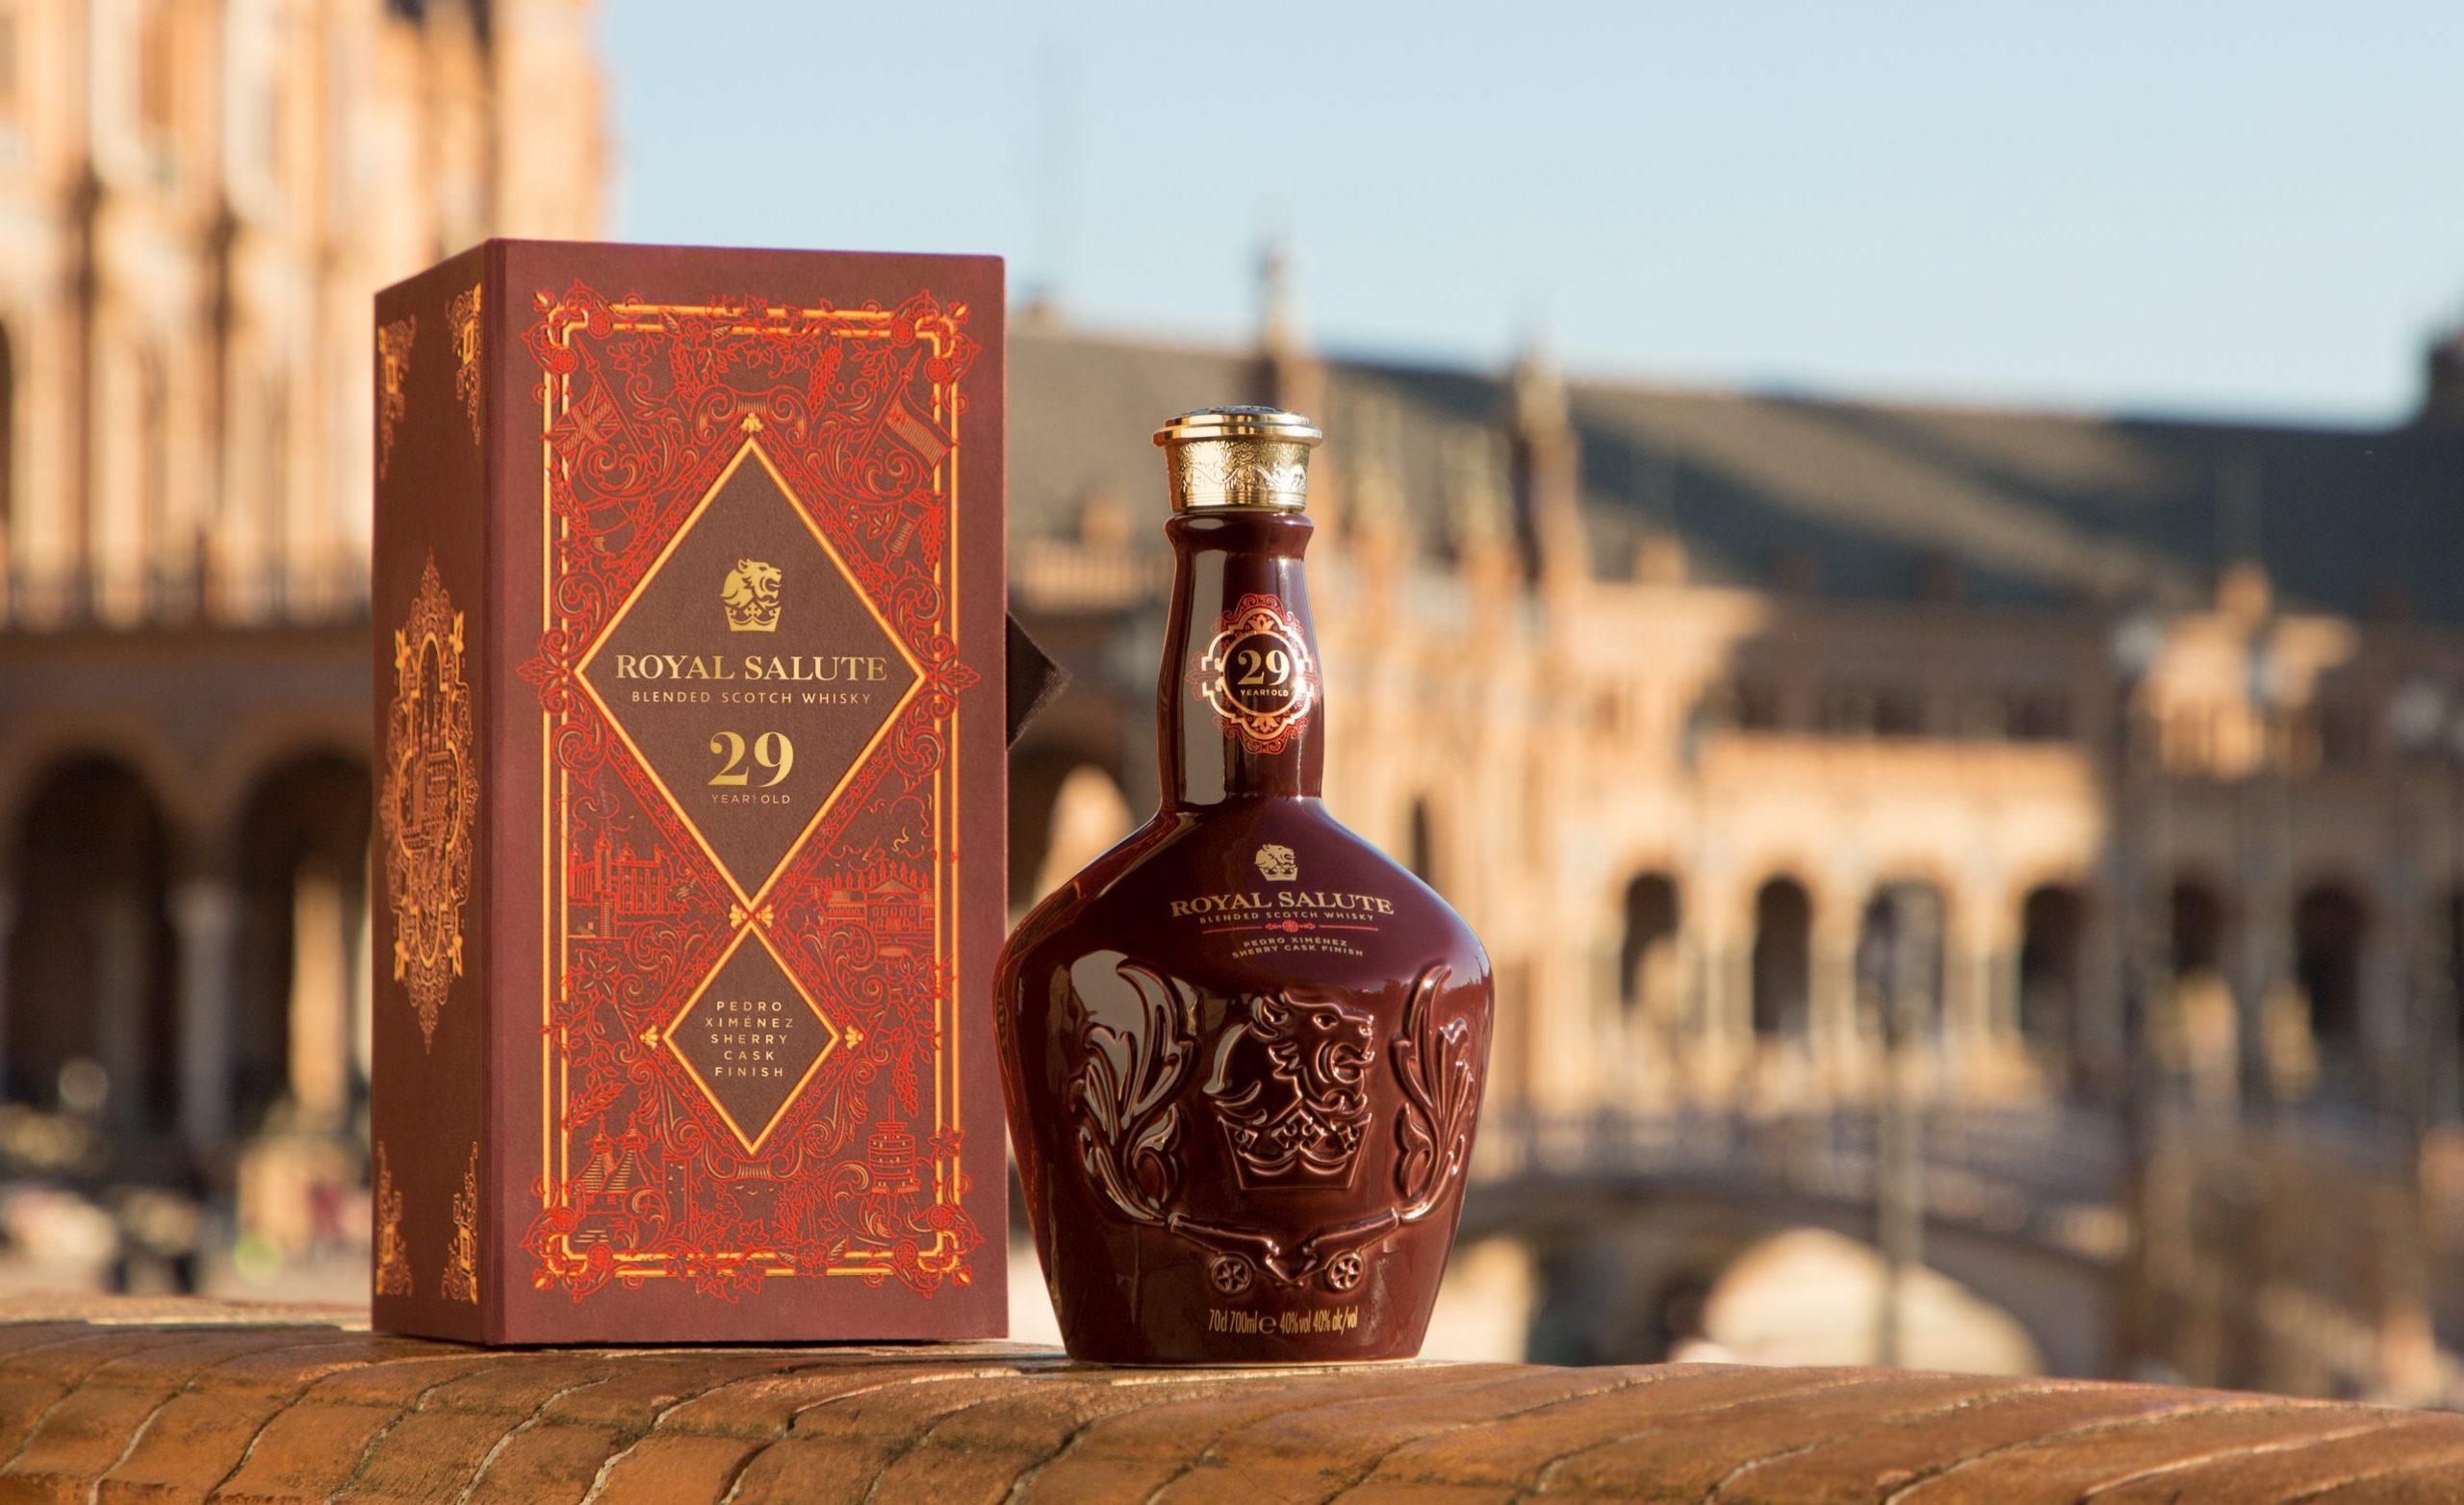 Royal Salute Blended Scotch Whisky Pedro Ximénez Sherry Cask Finish